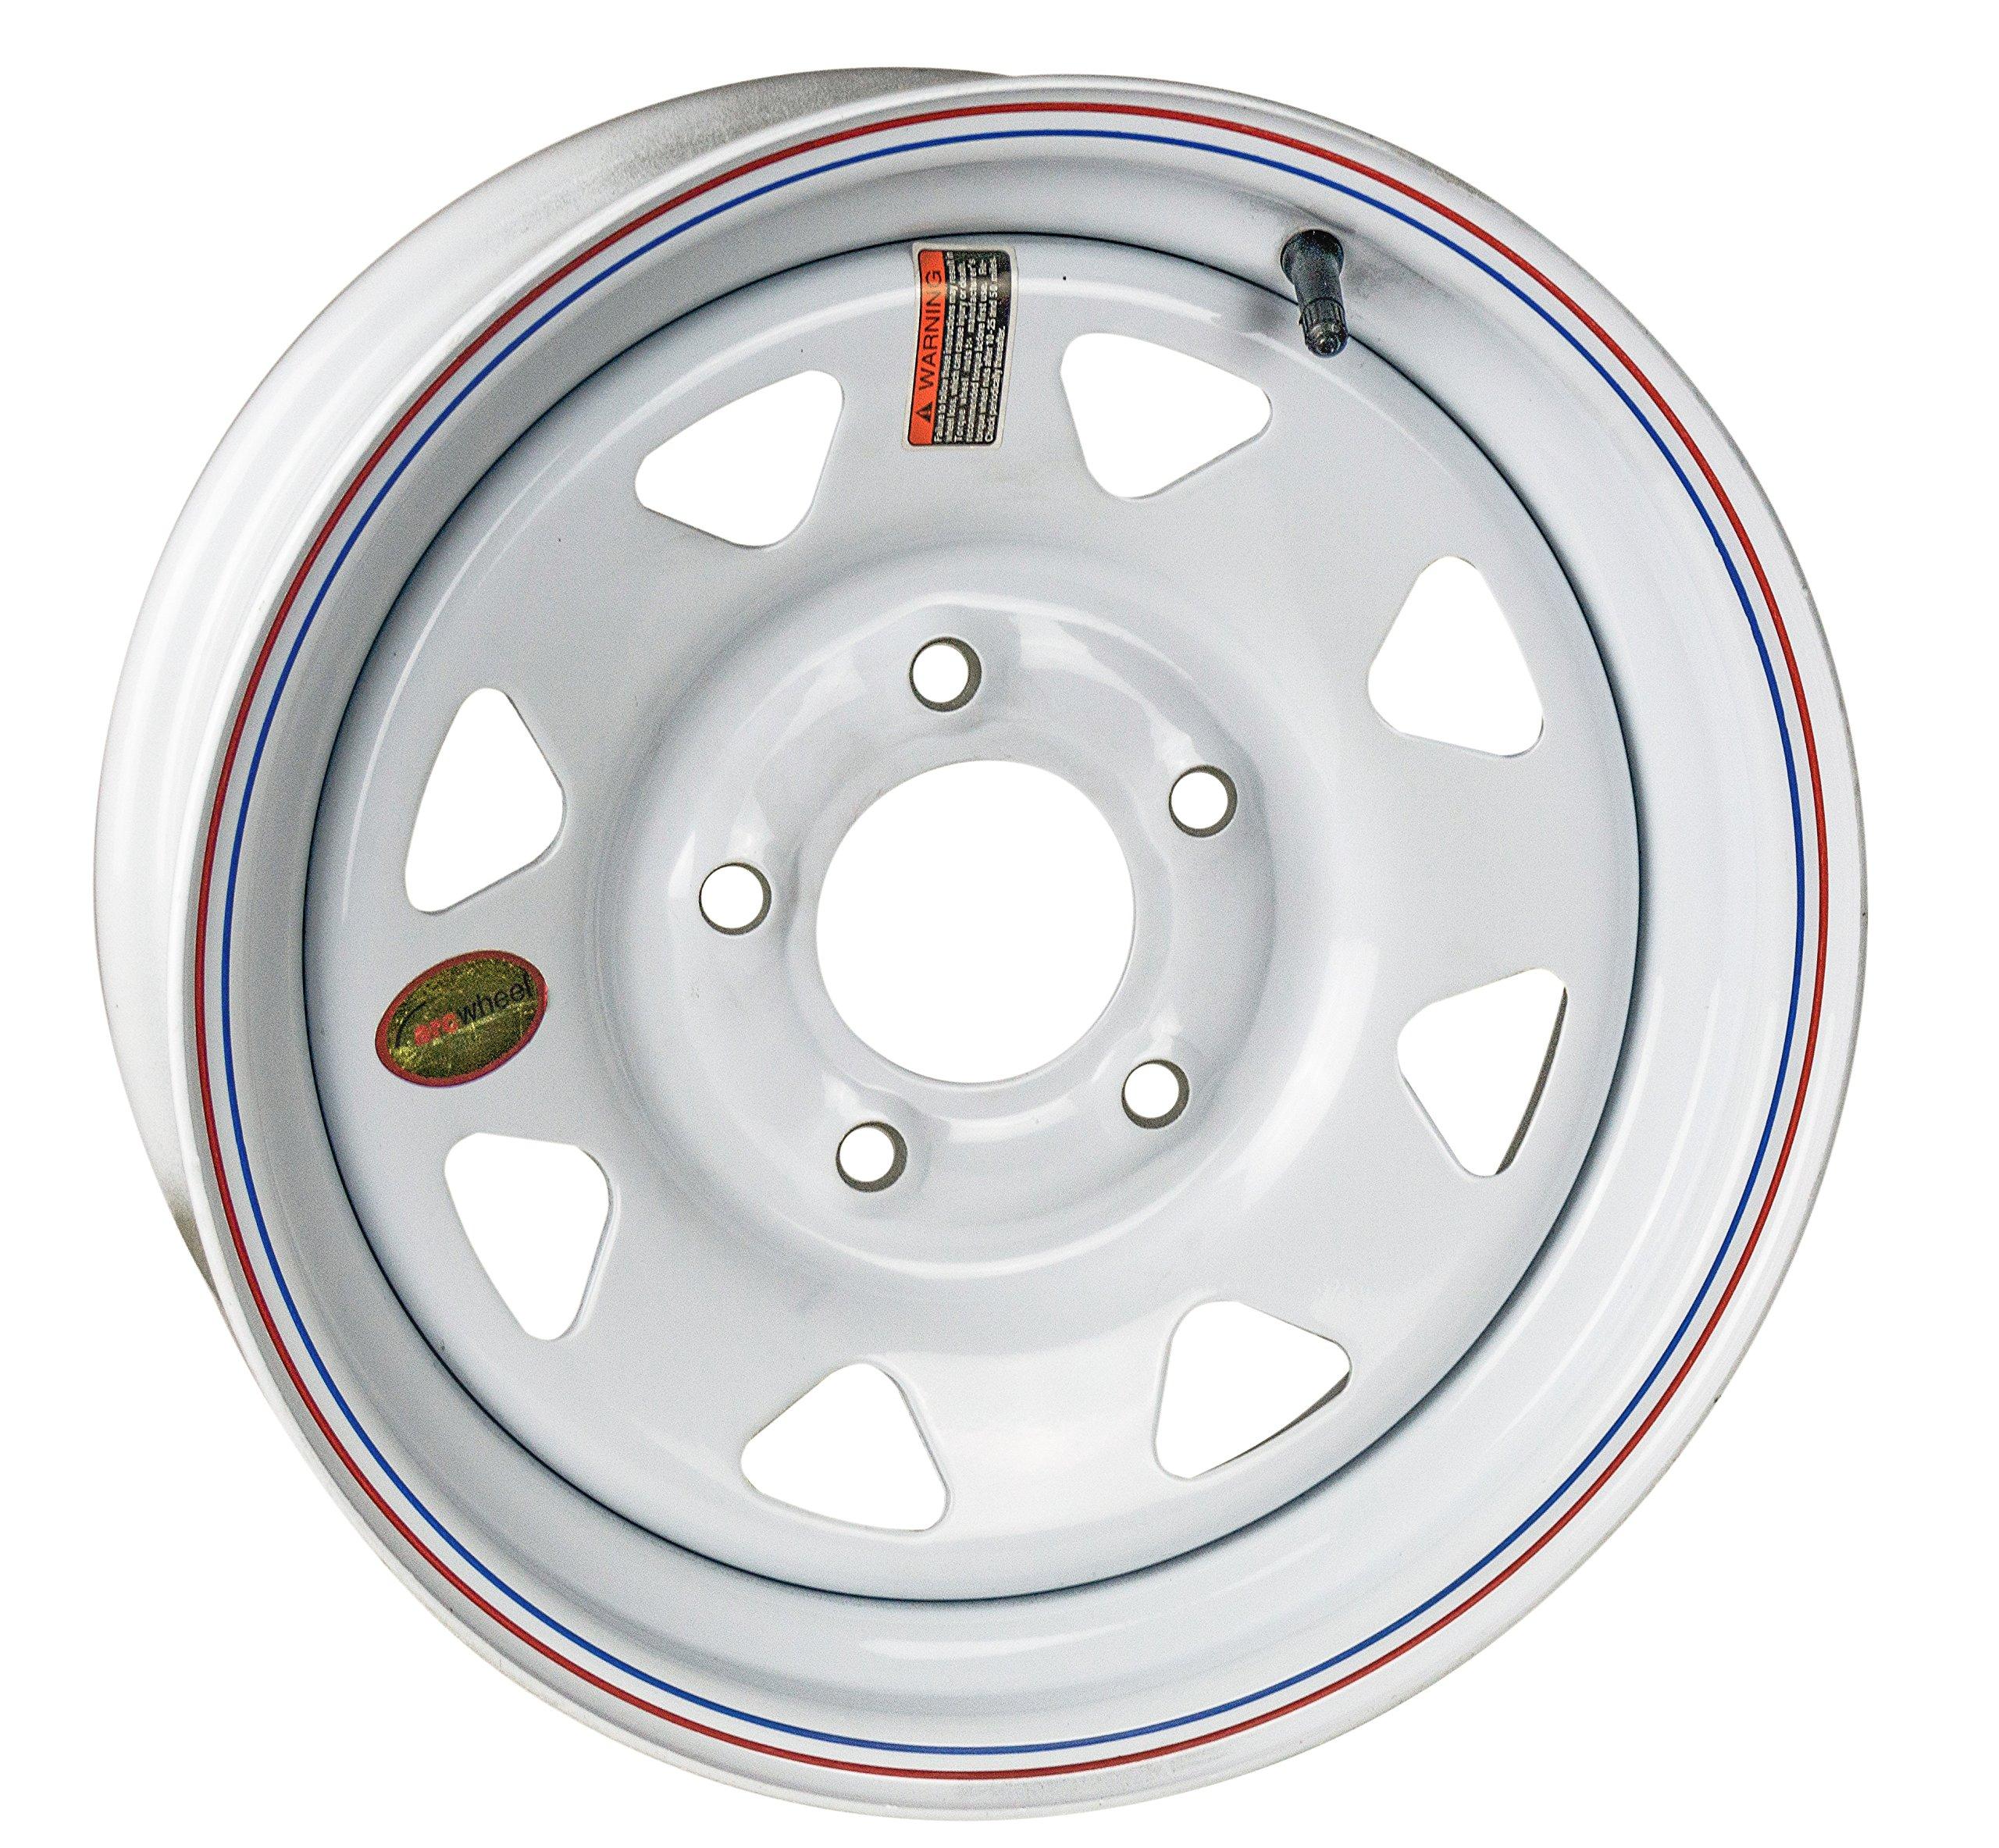 Arcwheel White Spoke Steel Trailer Wheel - 15'' x 5'' Rim - 5 on 5 1,870lb Capacity